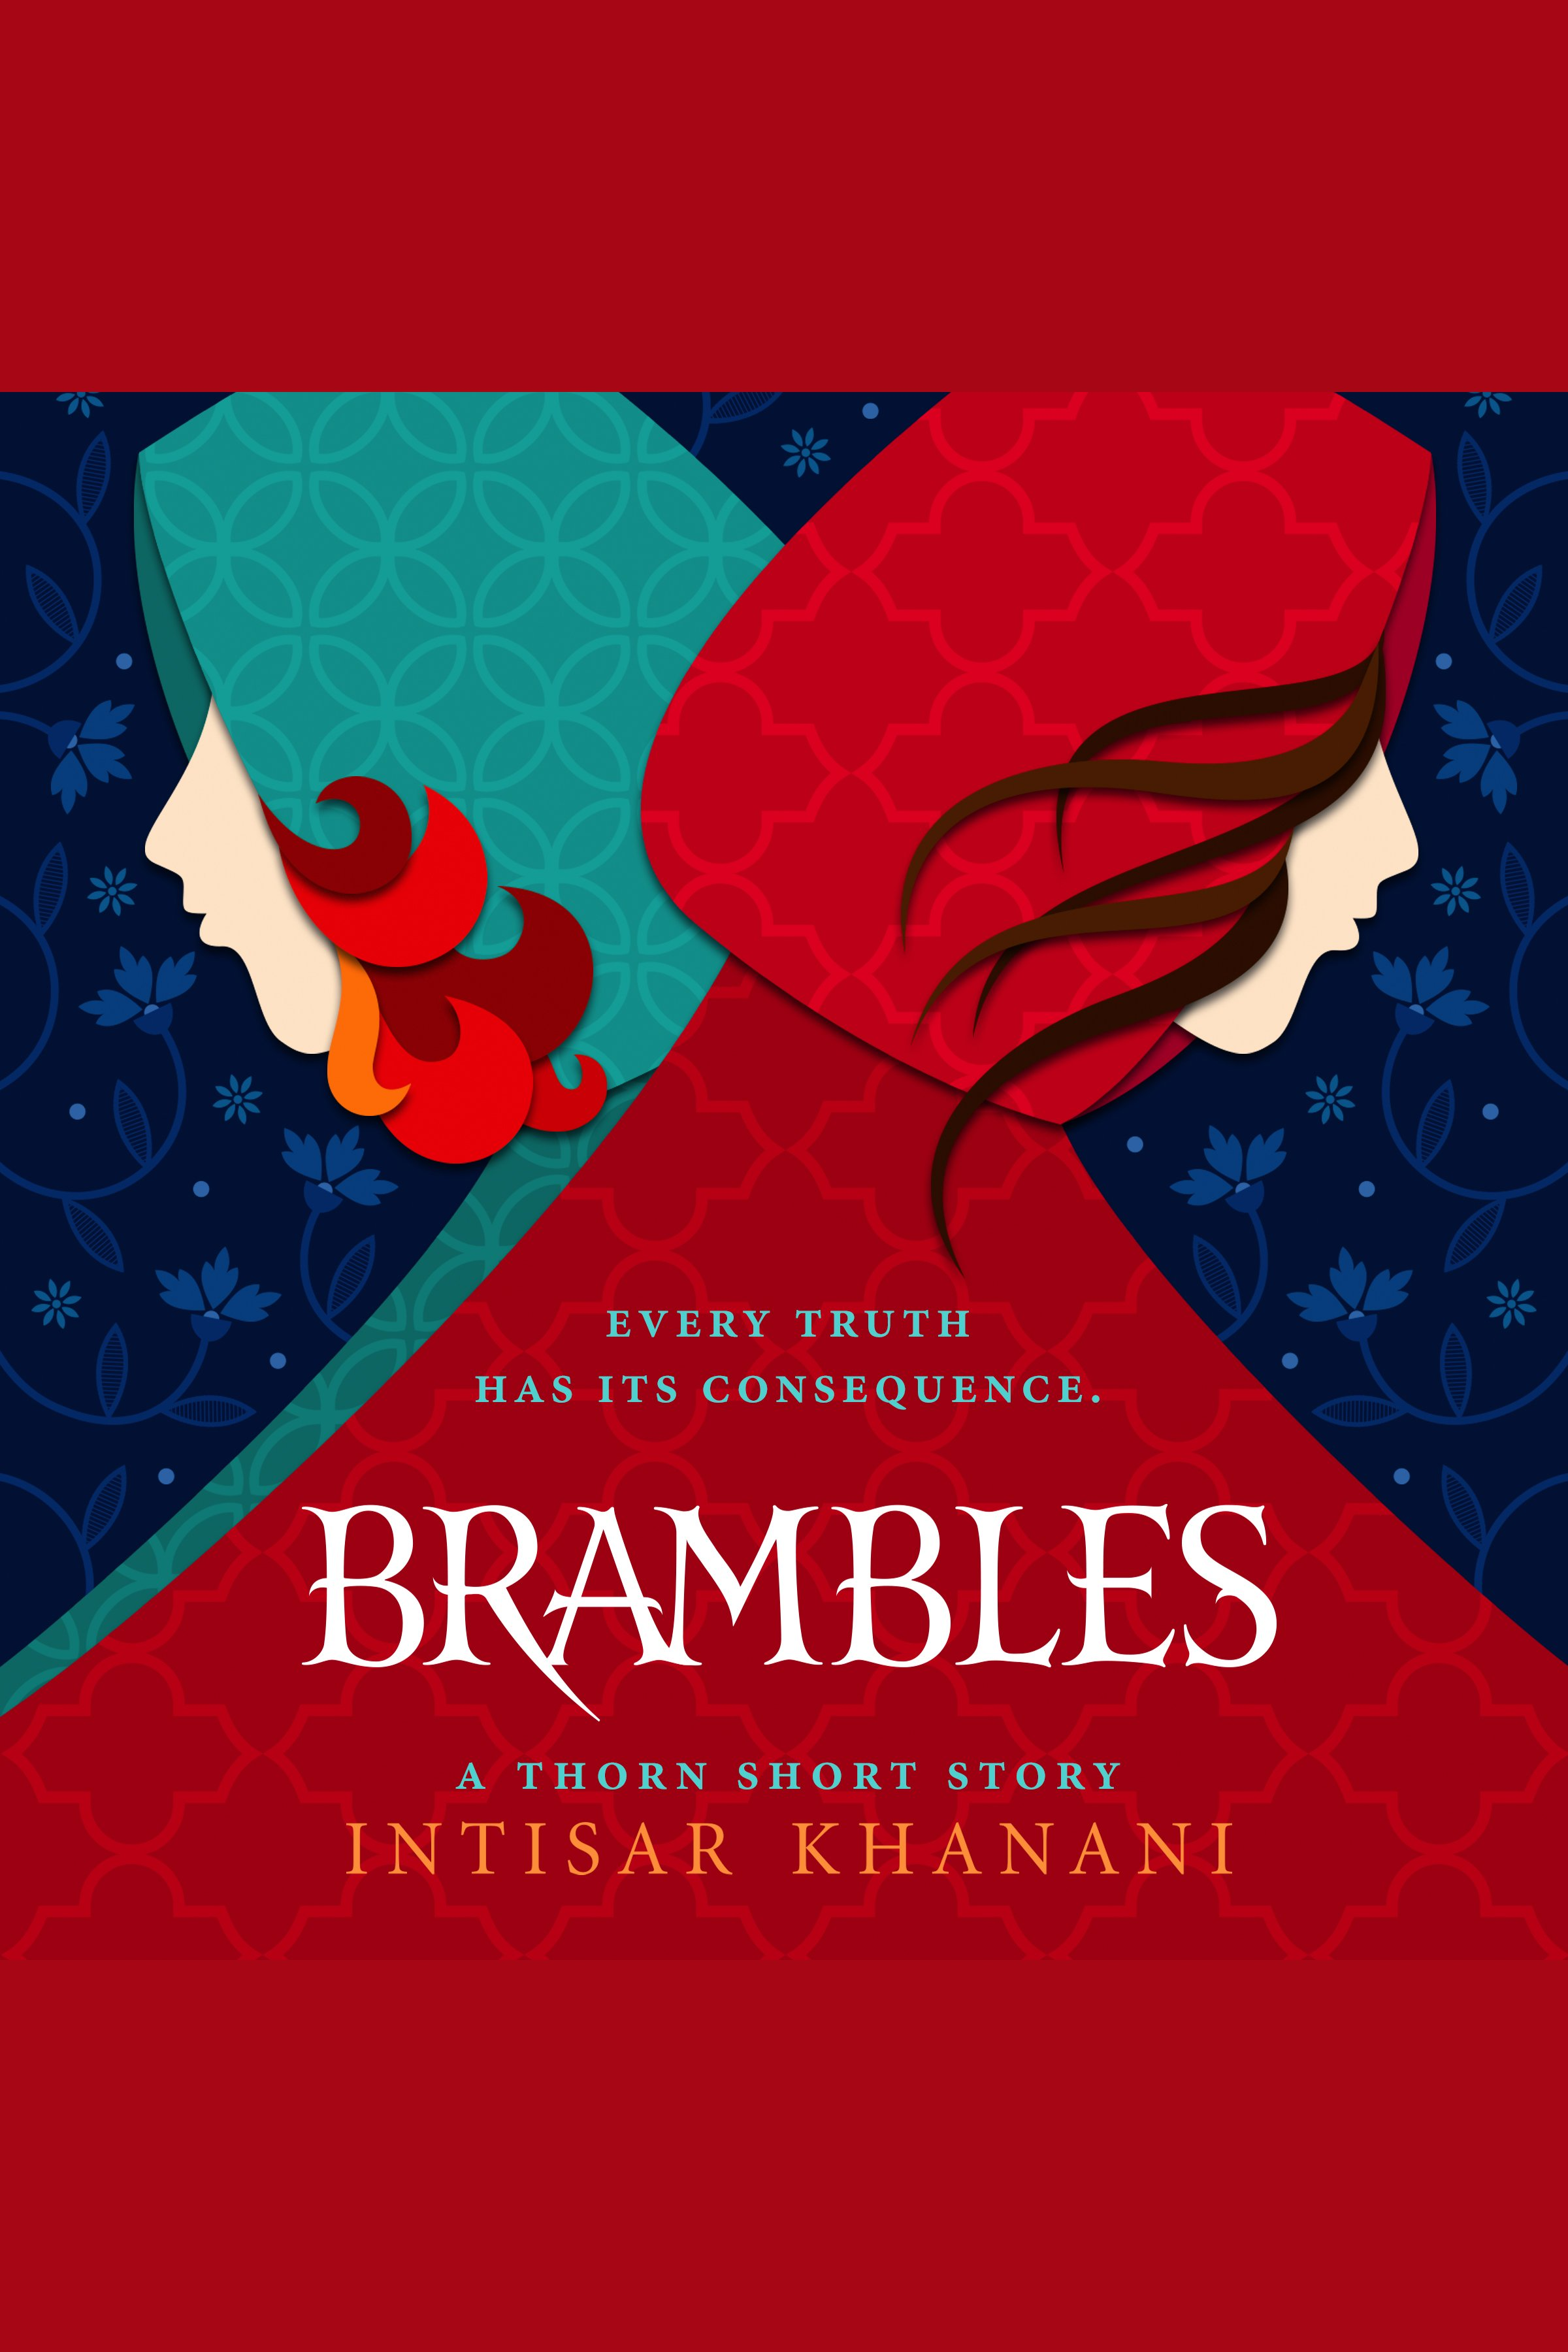 Brambles A Thorn Short Story